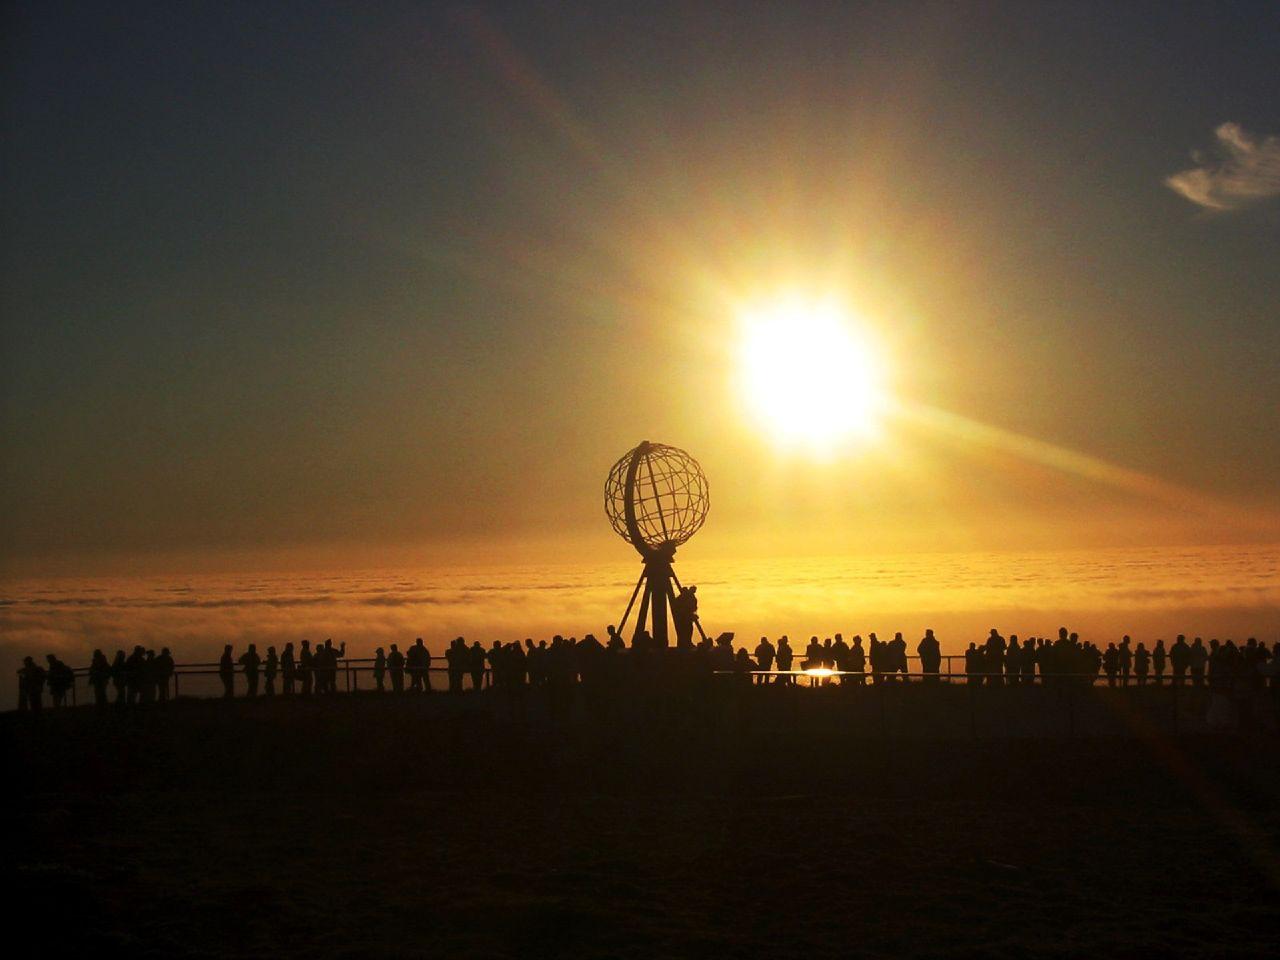 Lapland, Sebuah Tempat yang Menghadirkan Keindahan Fenomena Matahari Tengah Malam